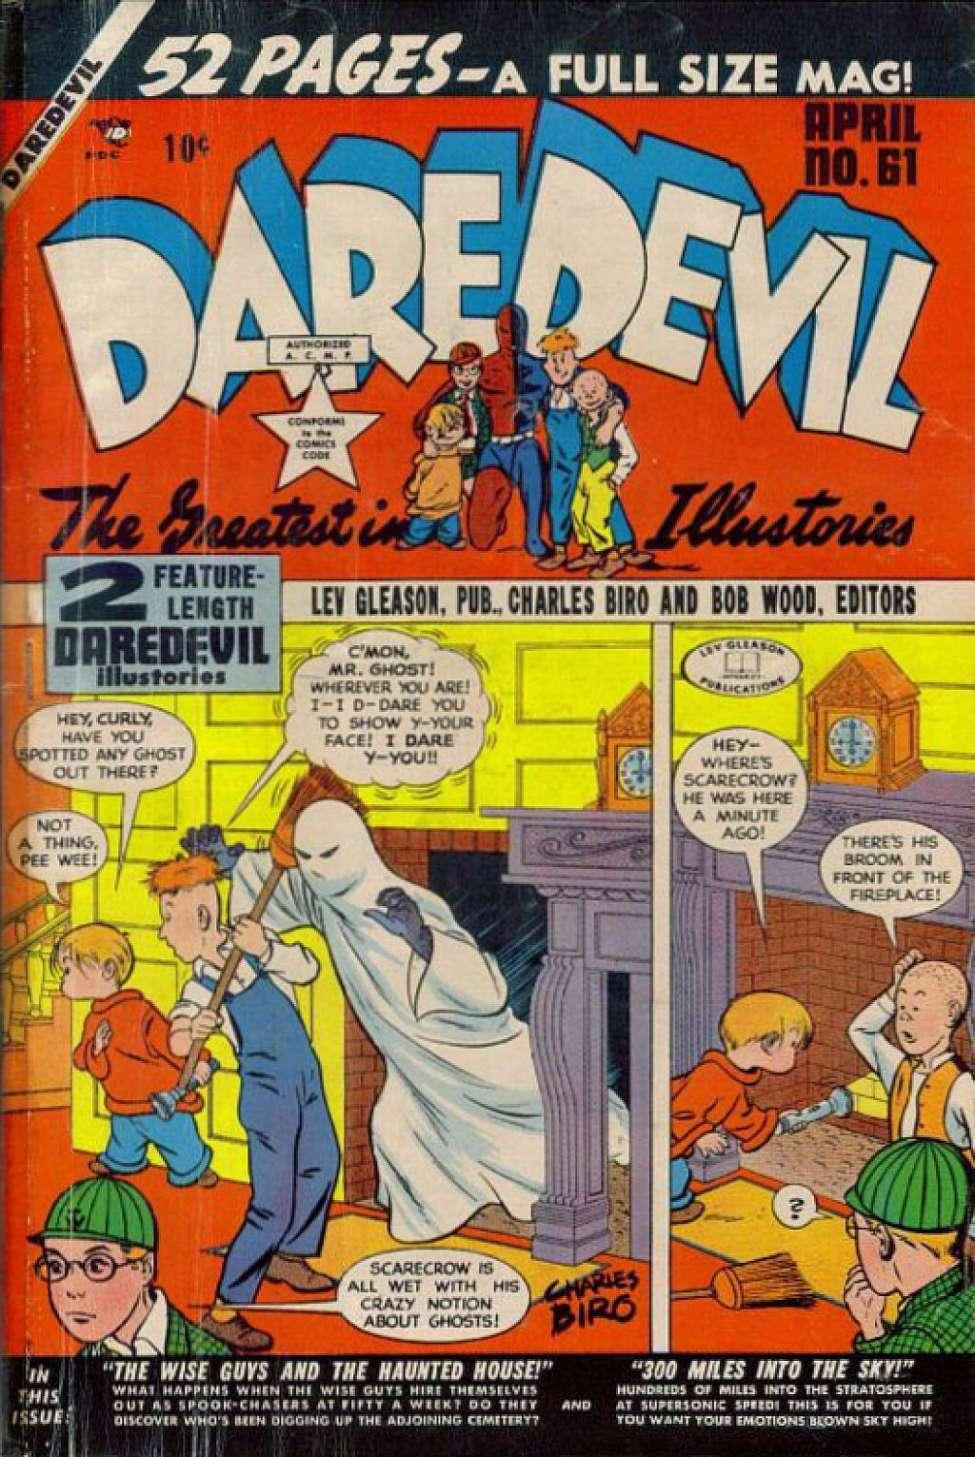 Comic Book Cover For Daredevil - The Complete Archive Part 6